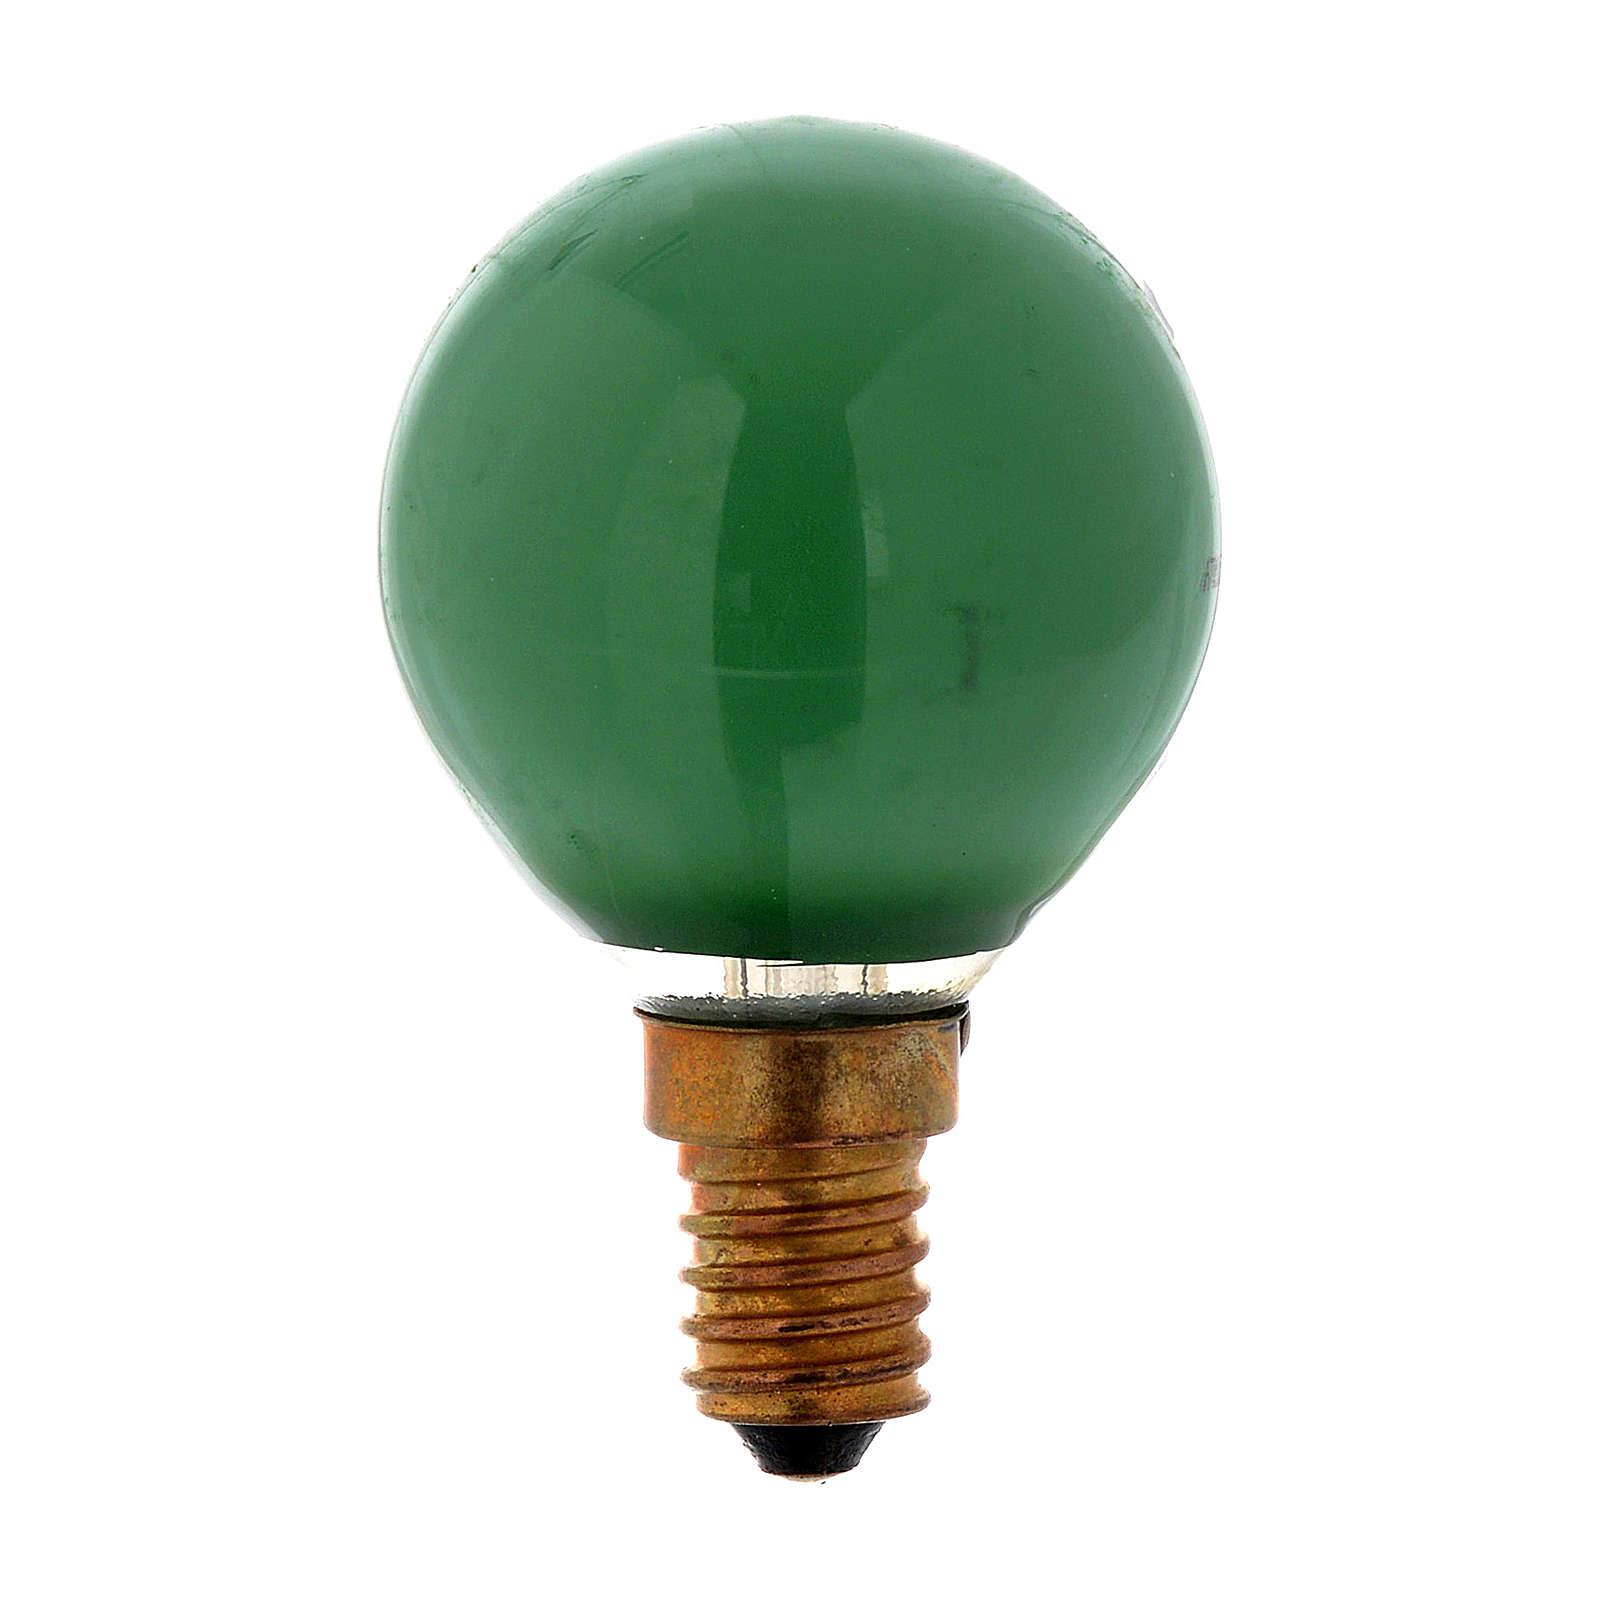 Lampada 25W verde E14 per illuminazione presepi 4